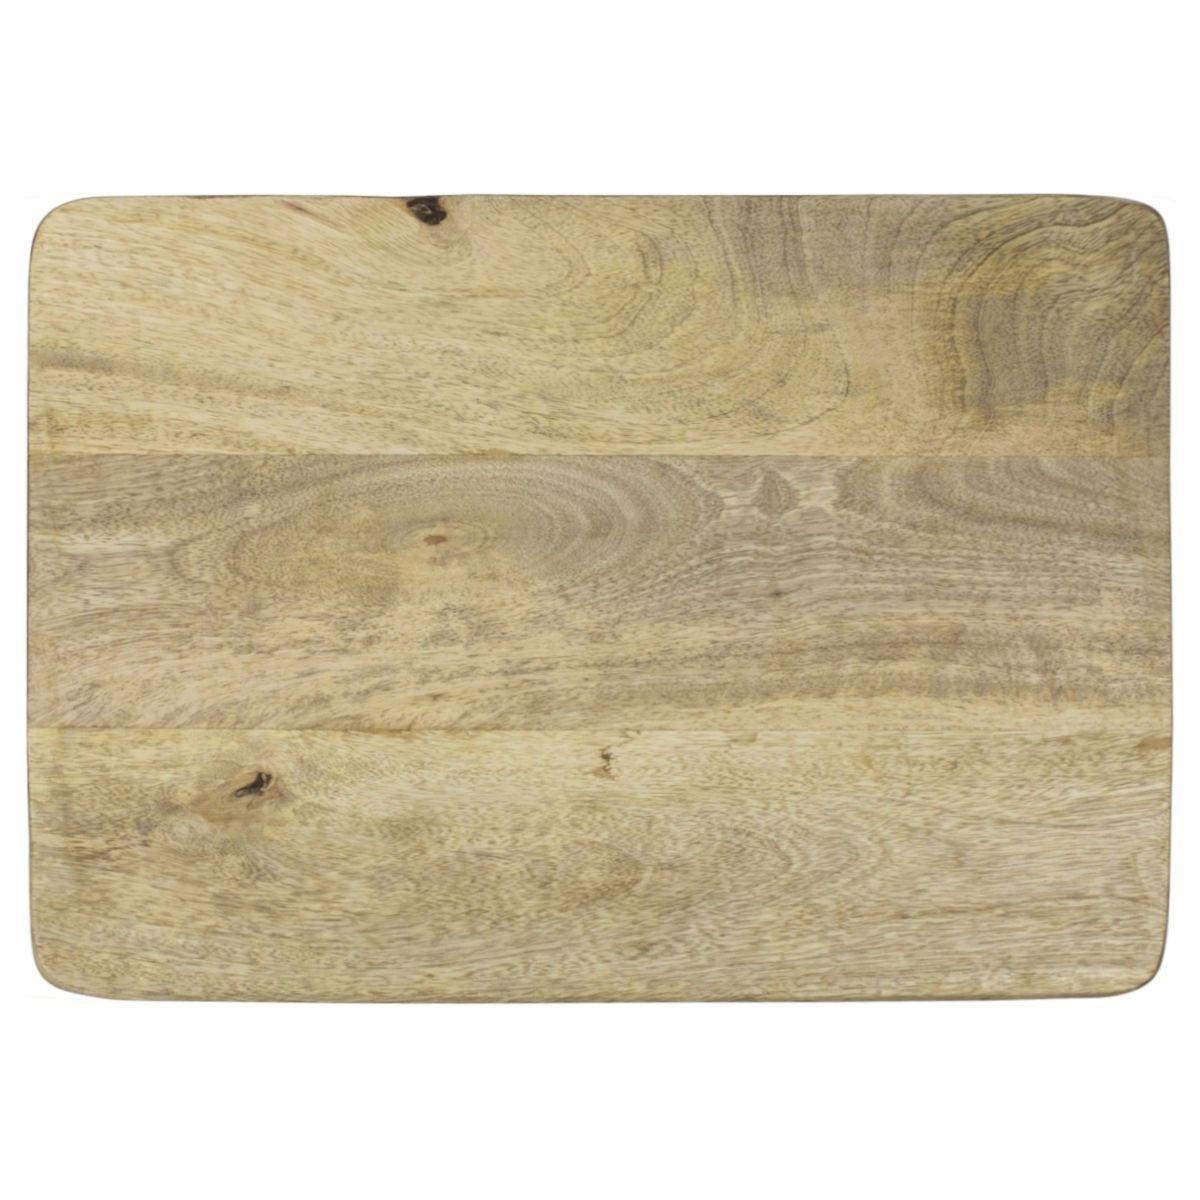 Mango ξύλινος δίσκος σερβιρίσματος 37x25x4,5 cm